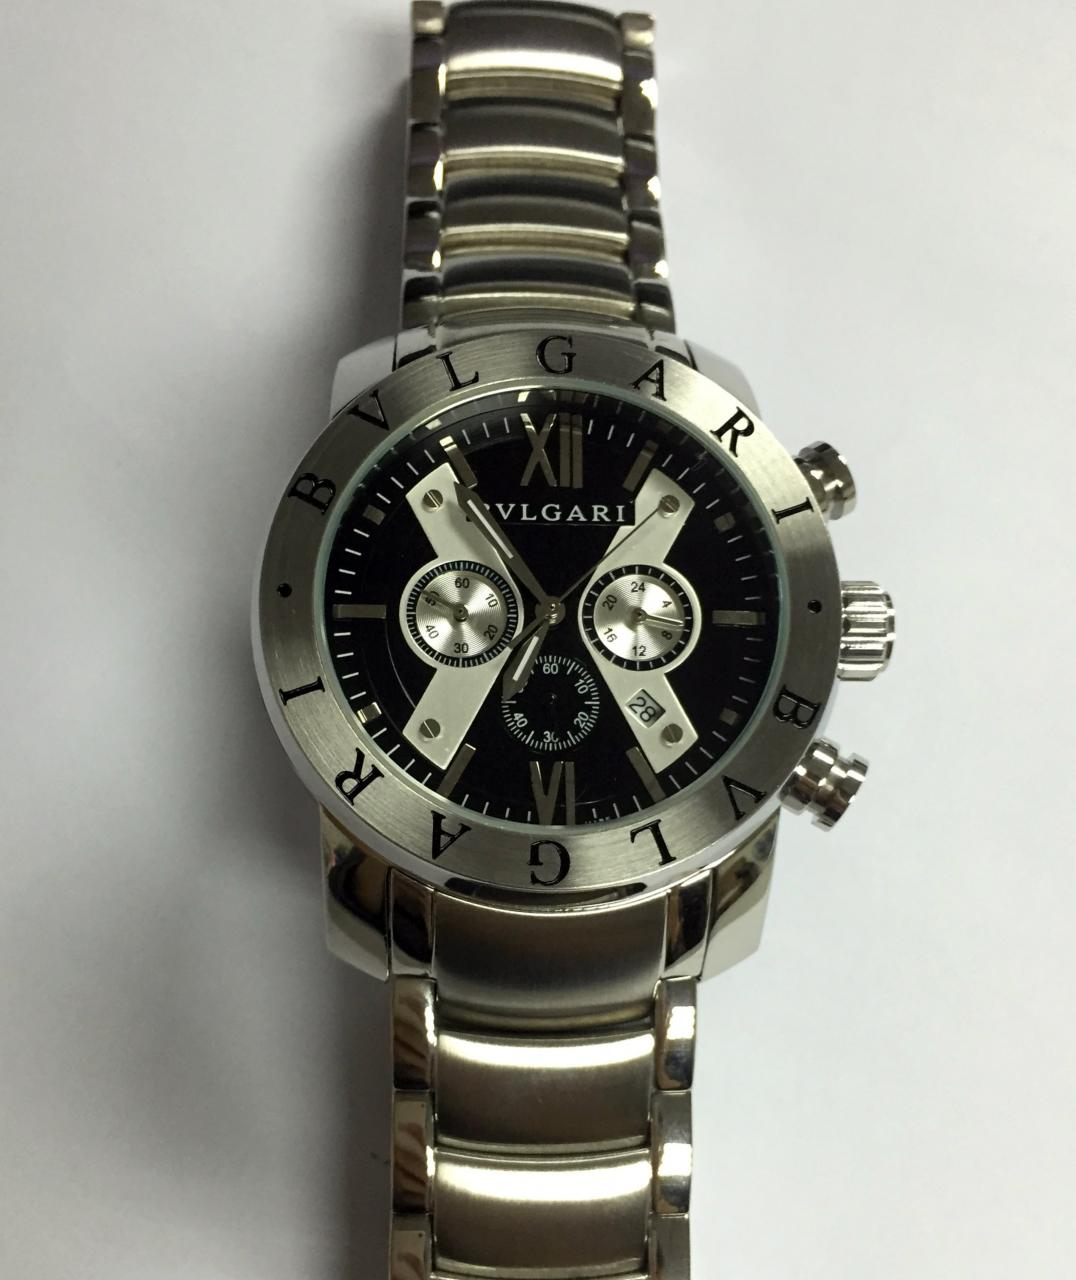 Bvlgari replica watches - Bvlgari Diagono Replica